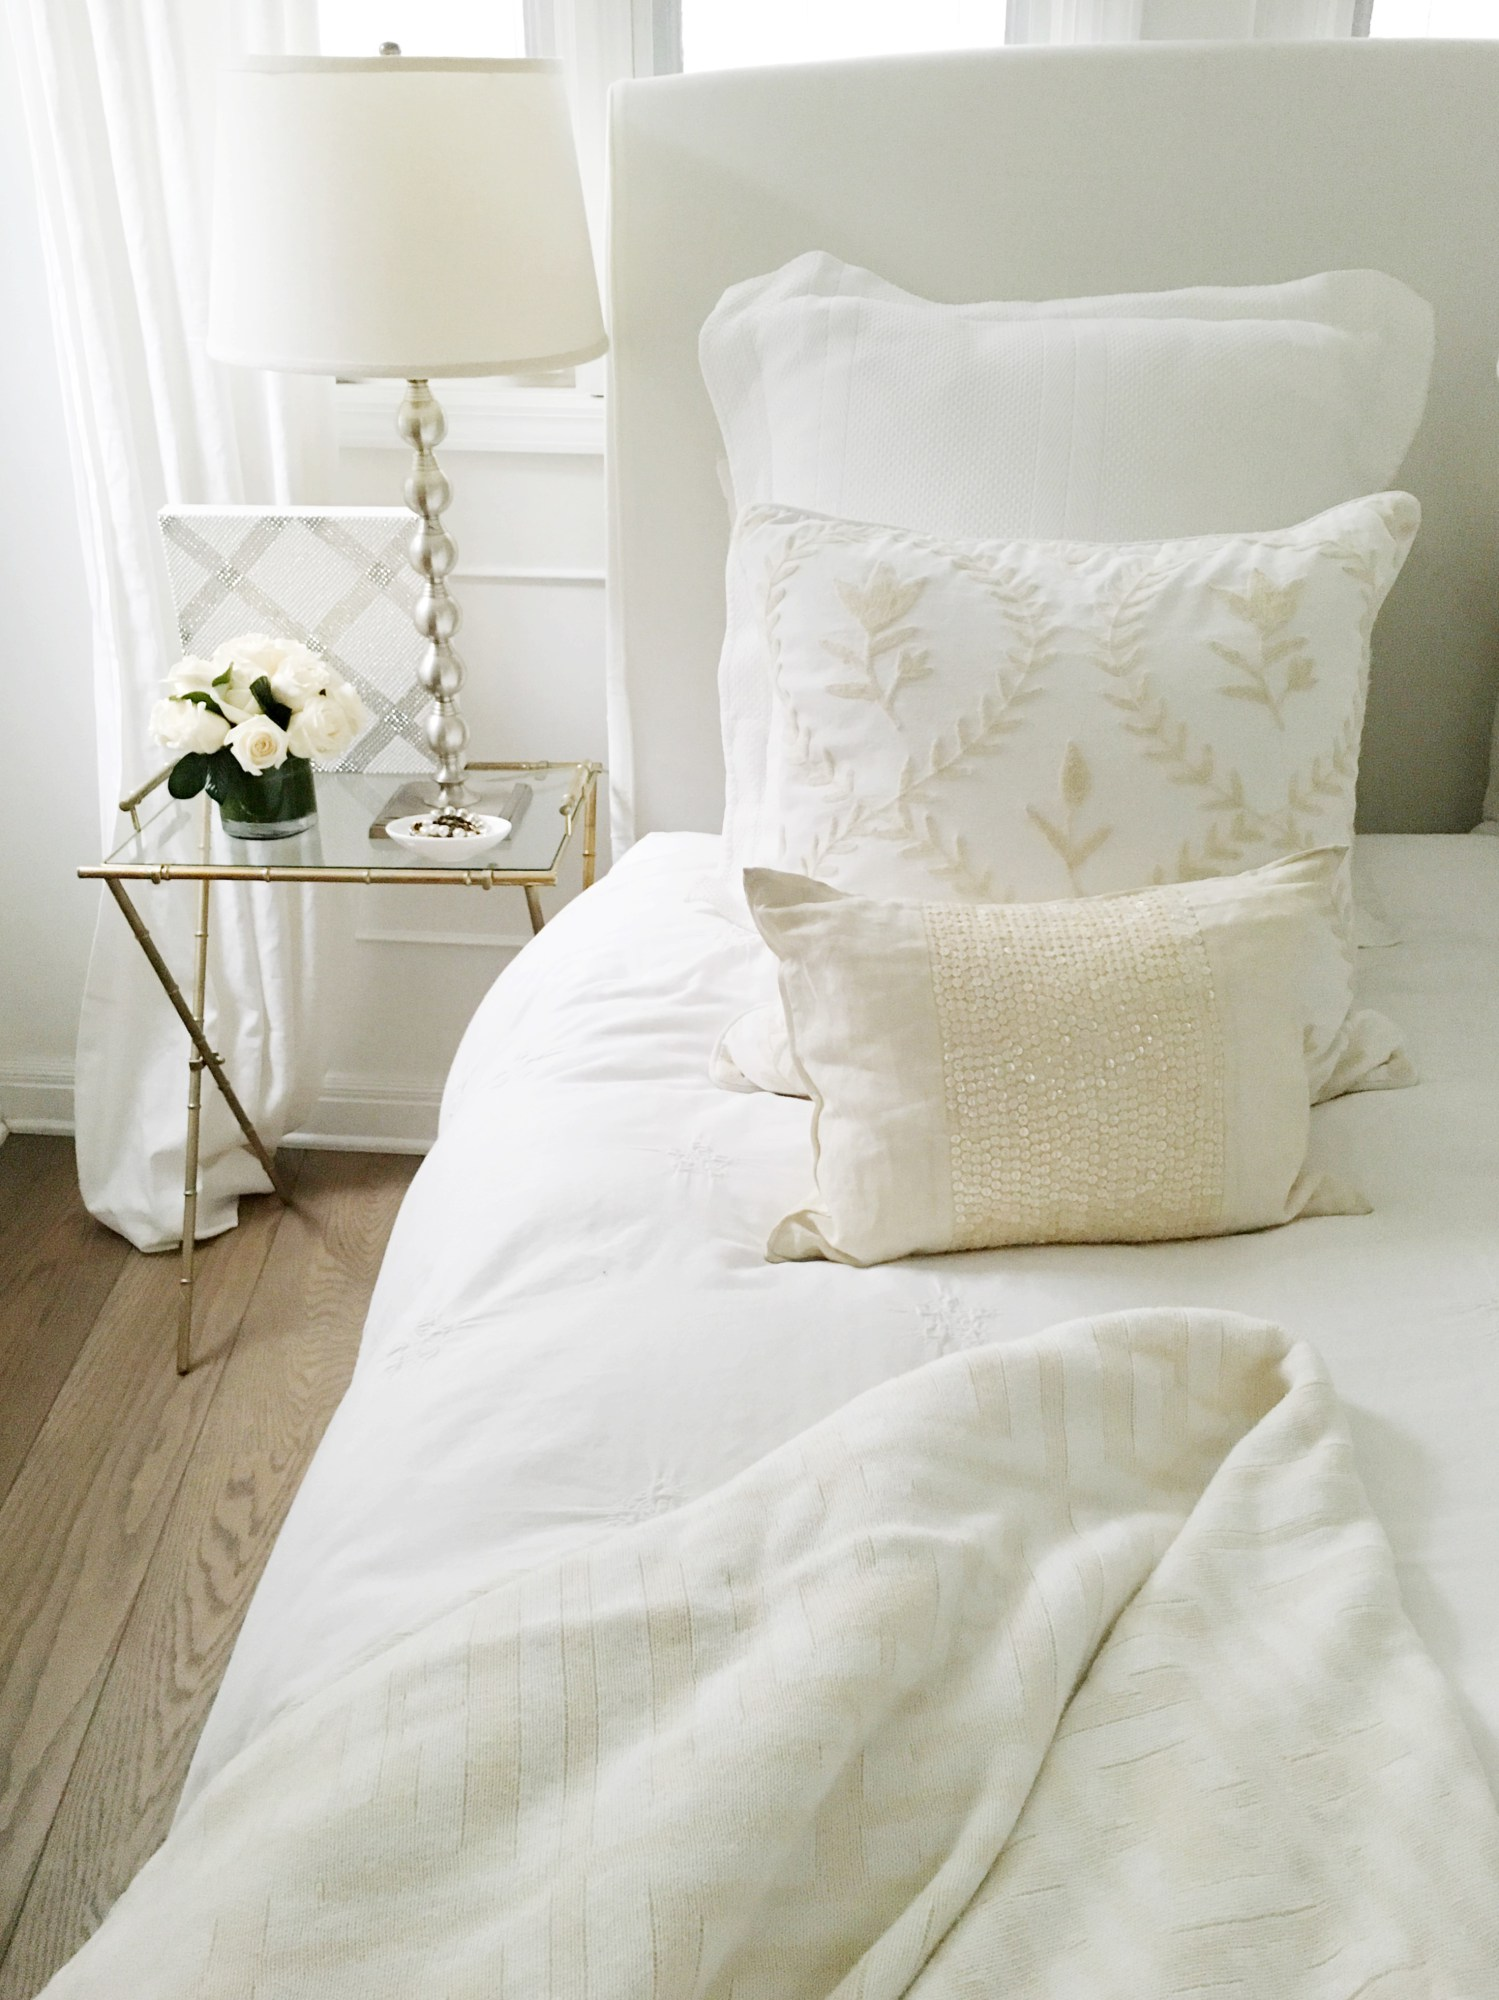 7-bedroom-styles-3